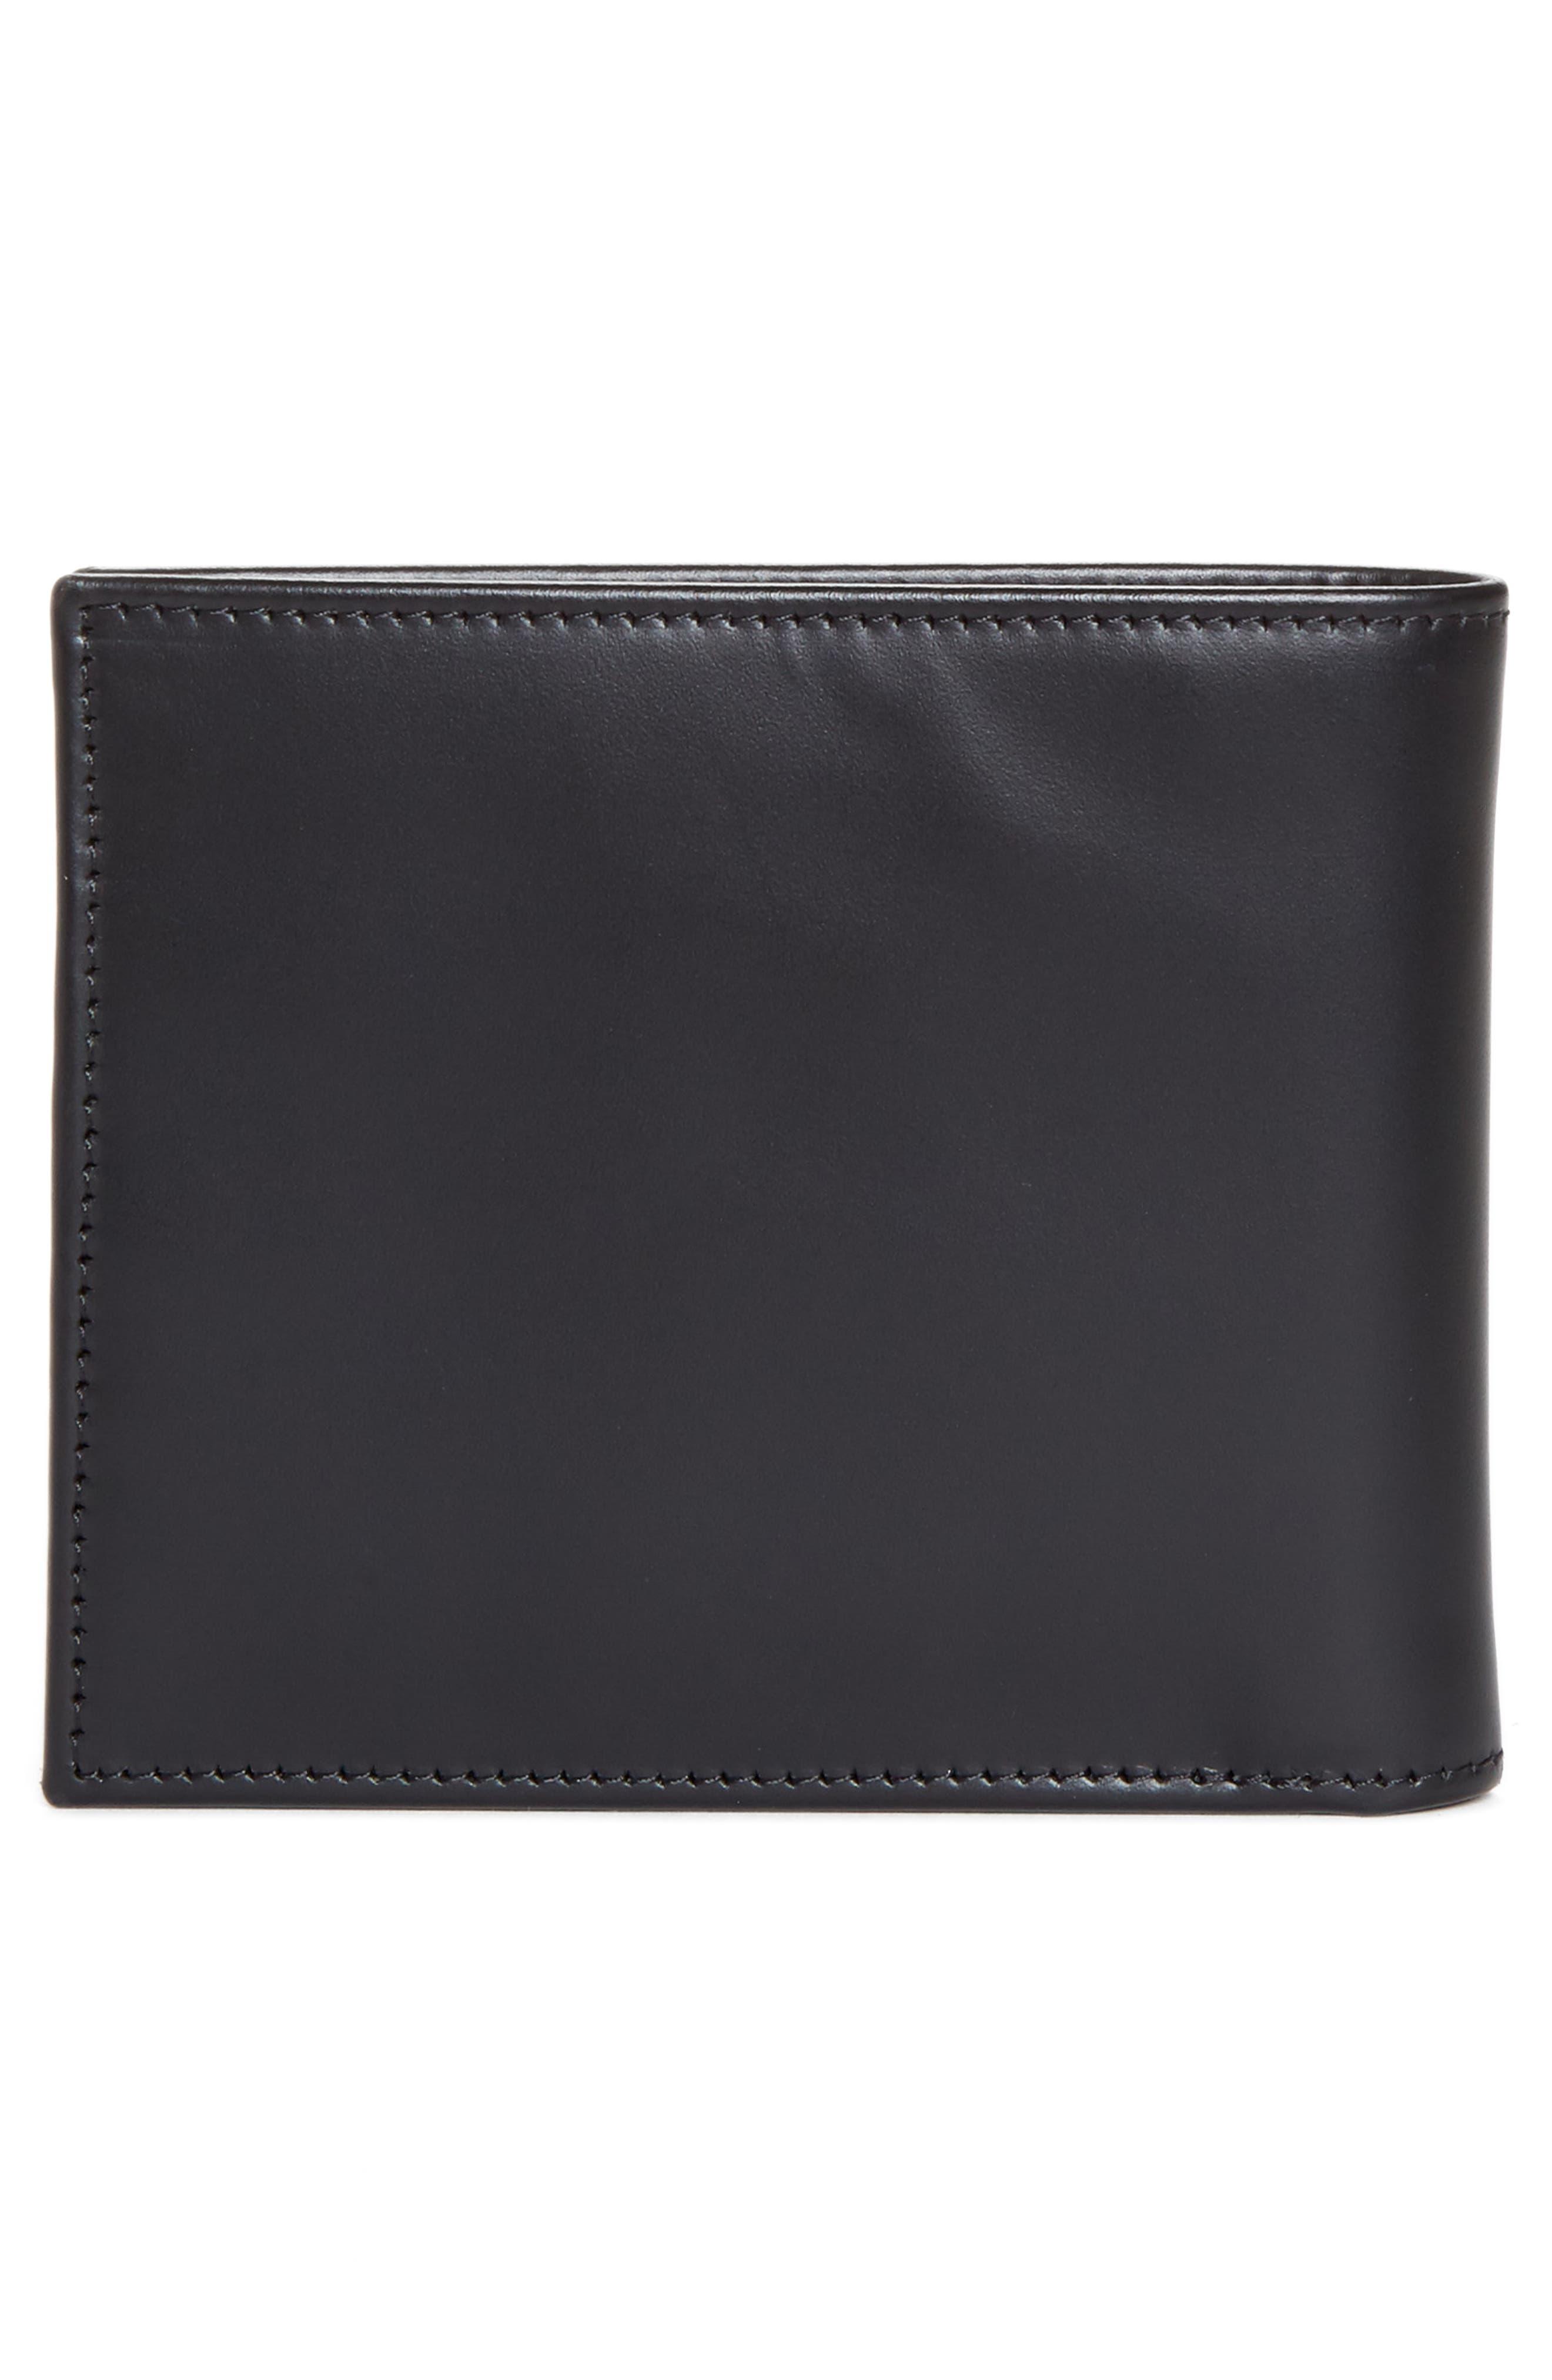 Multistripe Leather Wallet,                             Alternate thumbnail 5, color,